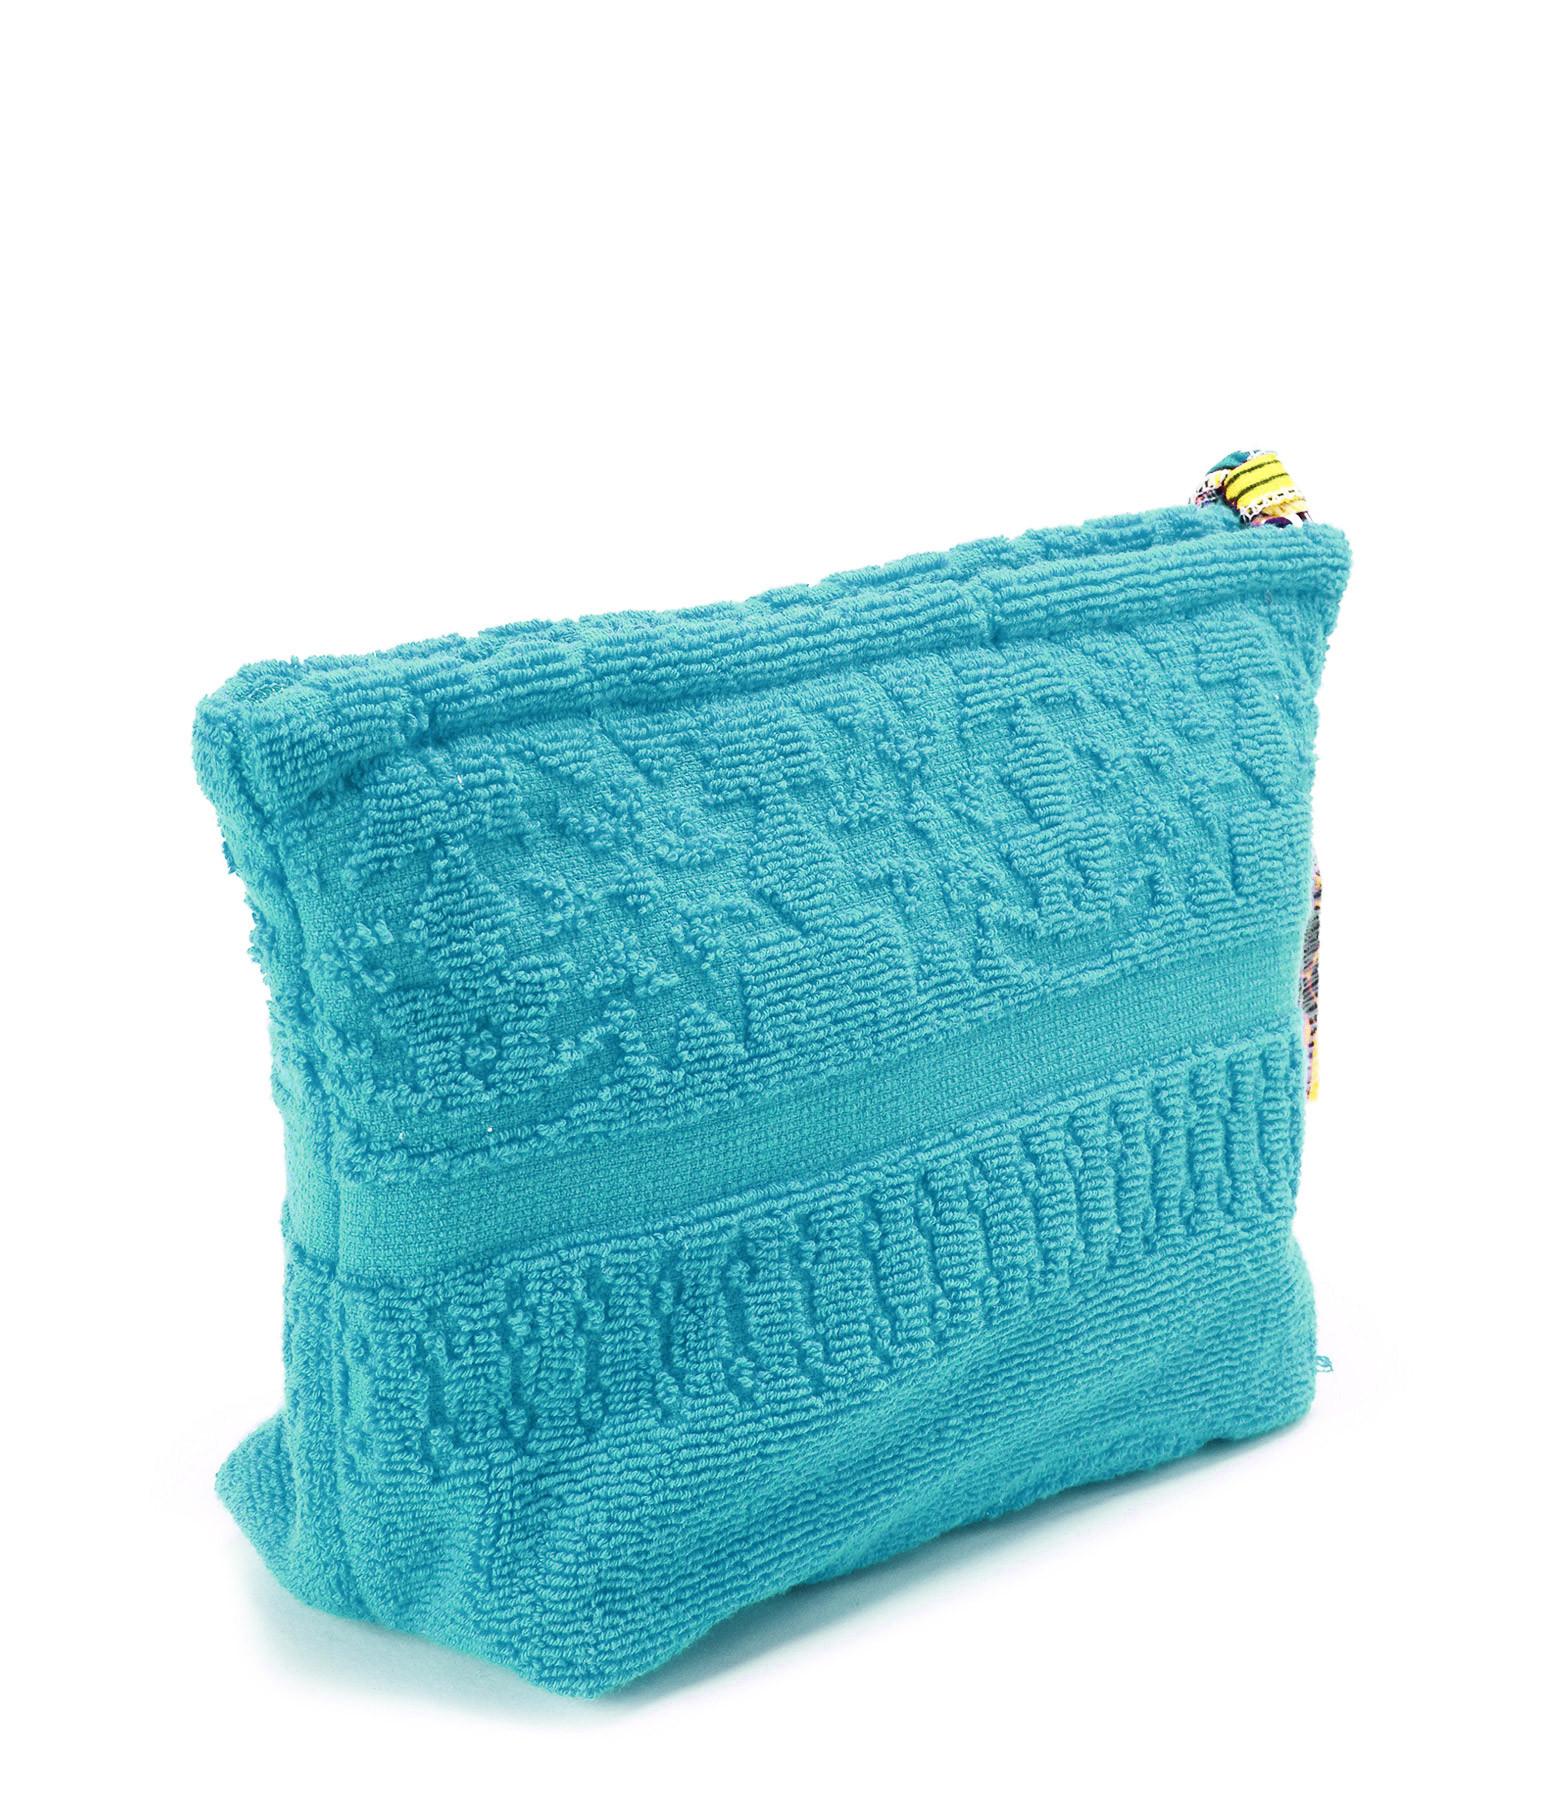 LALLA - Petite Trousse Walakin Eponge Turquoise